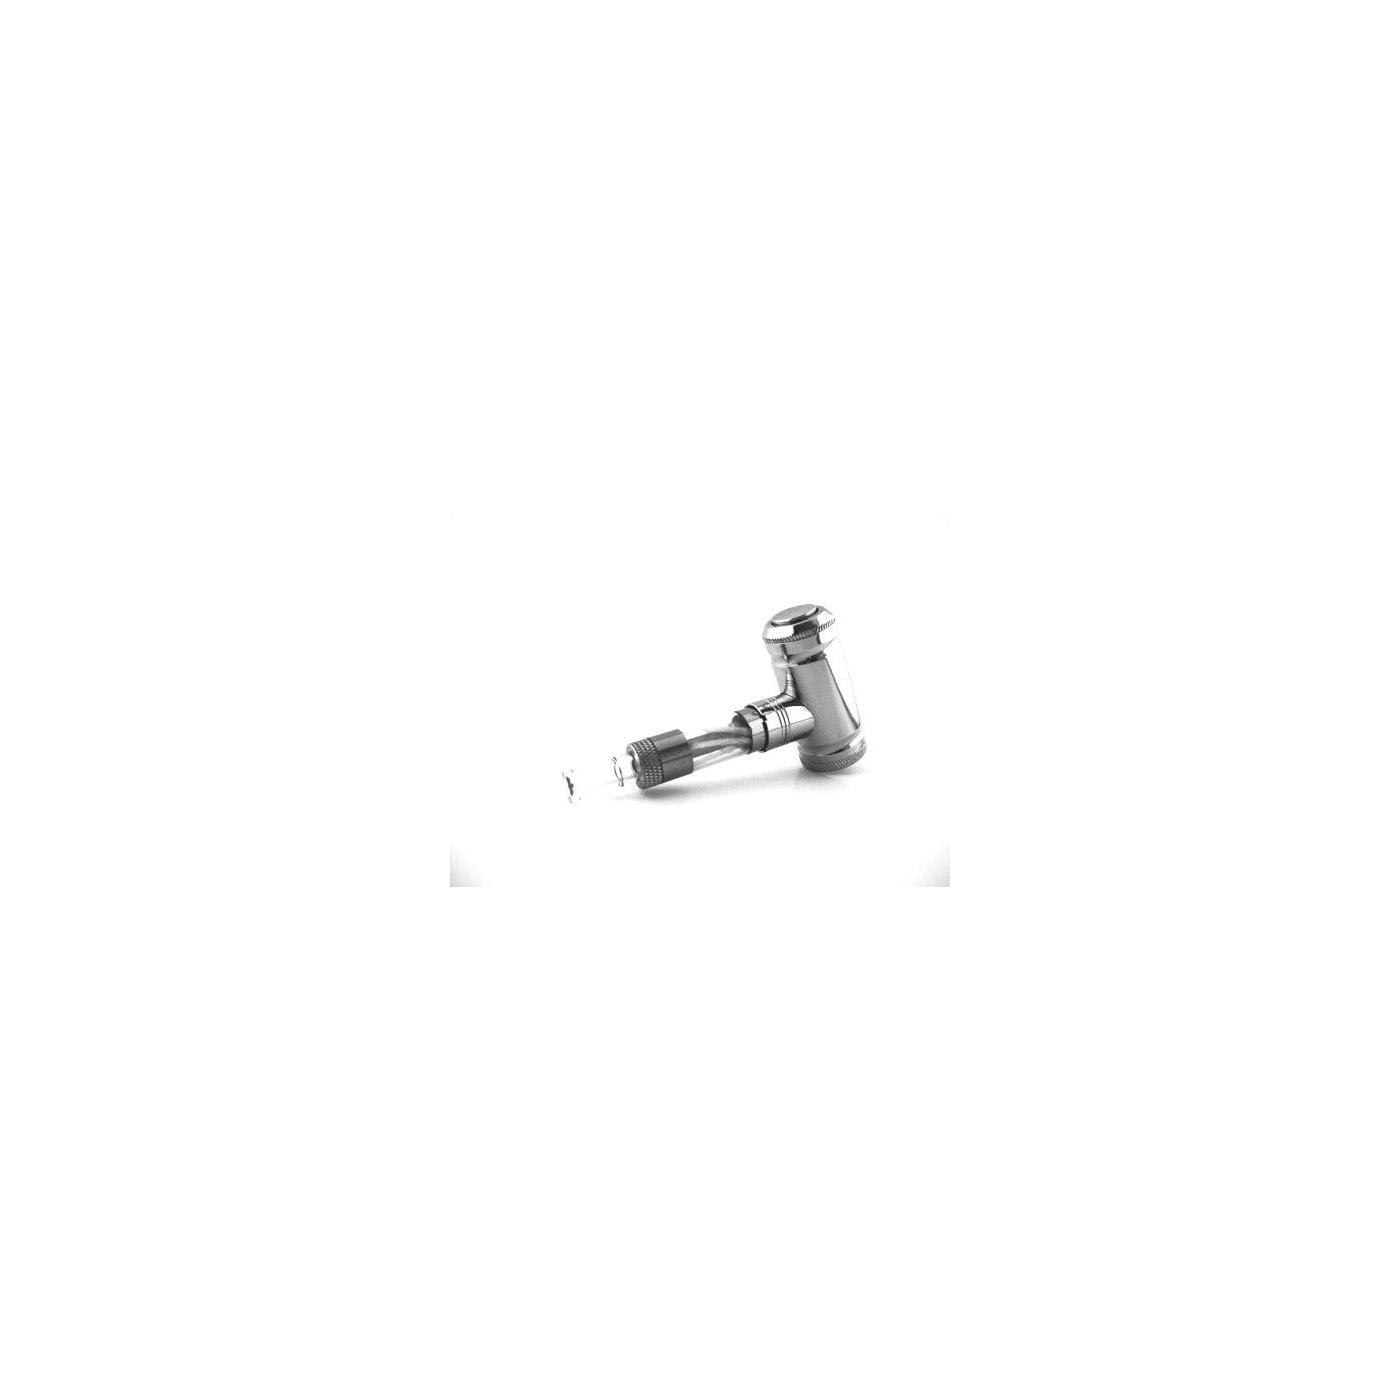 SmokTech E-Pipe Mod